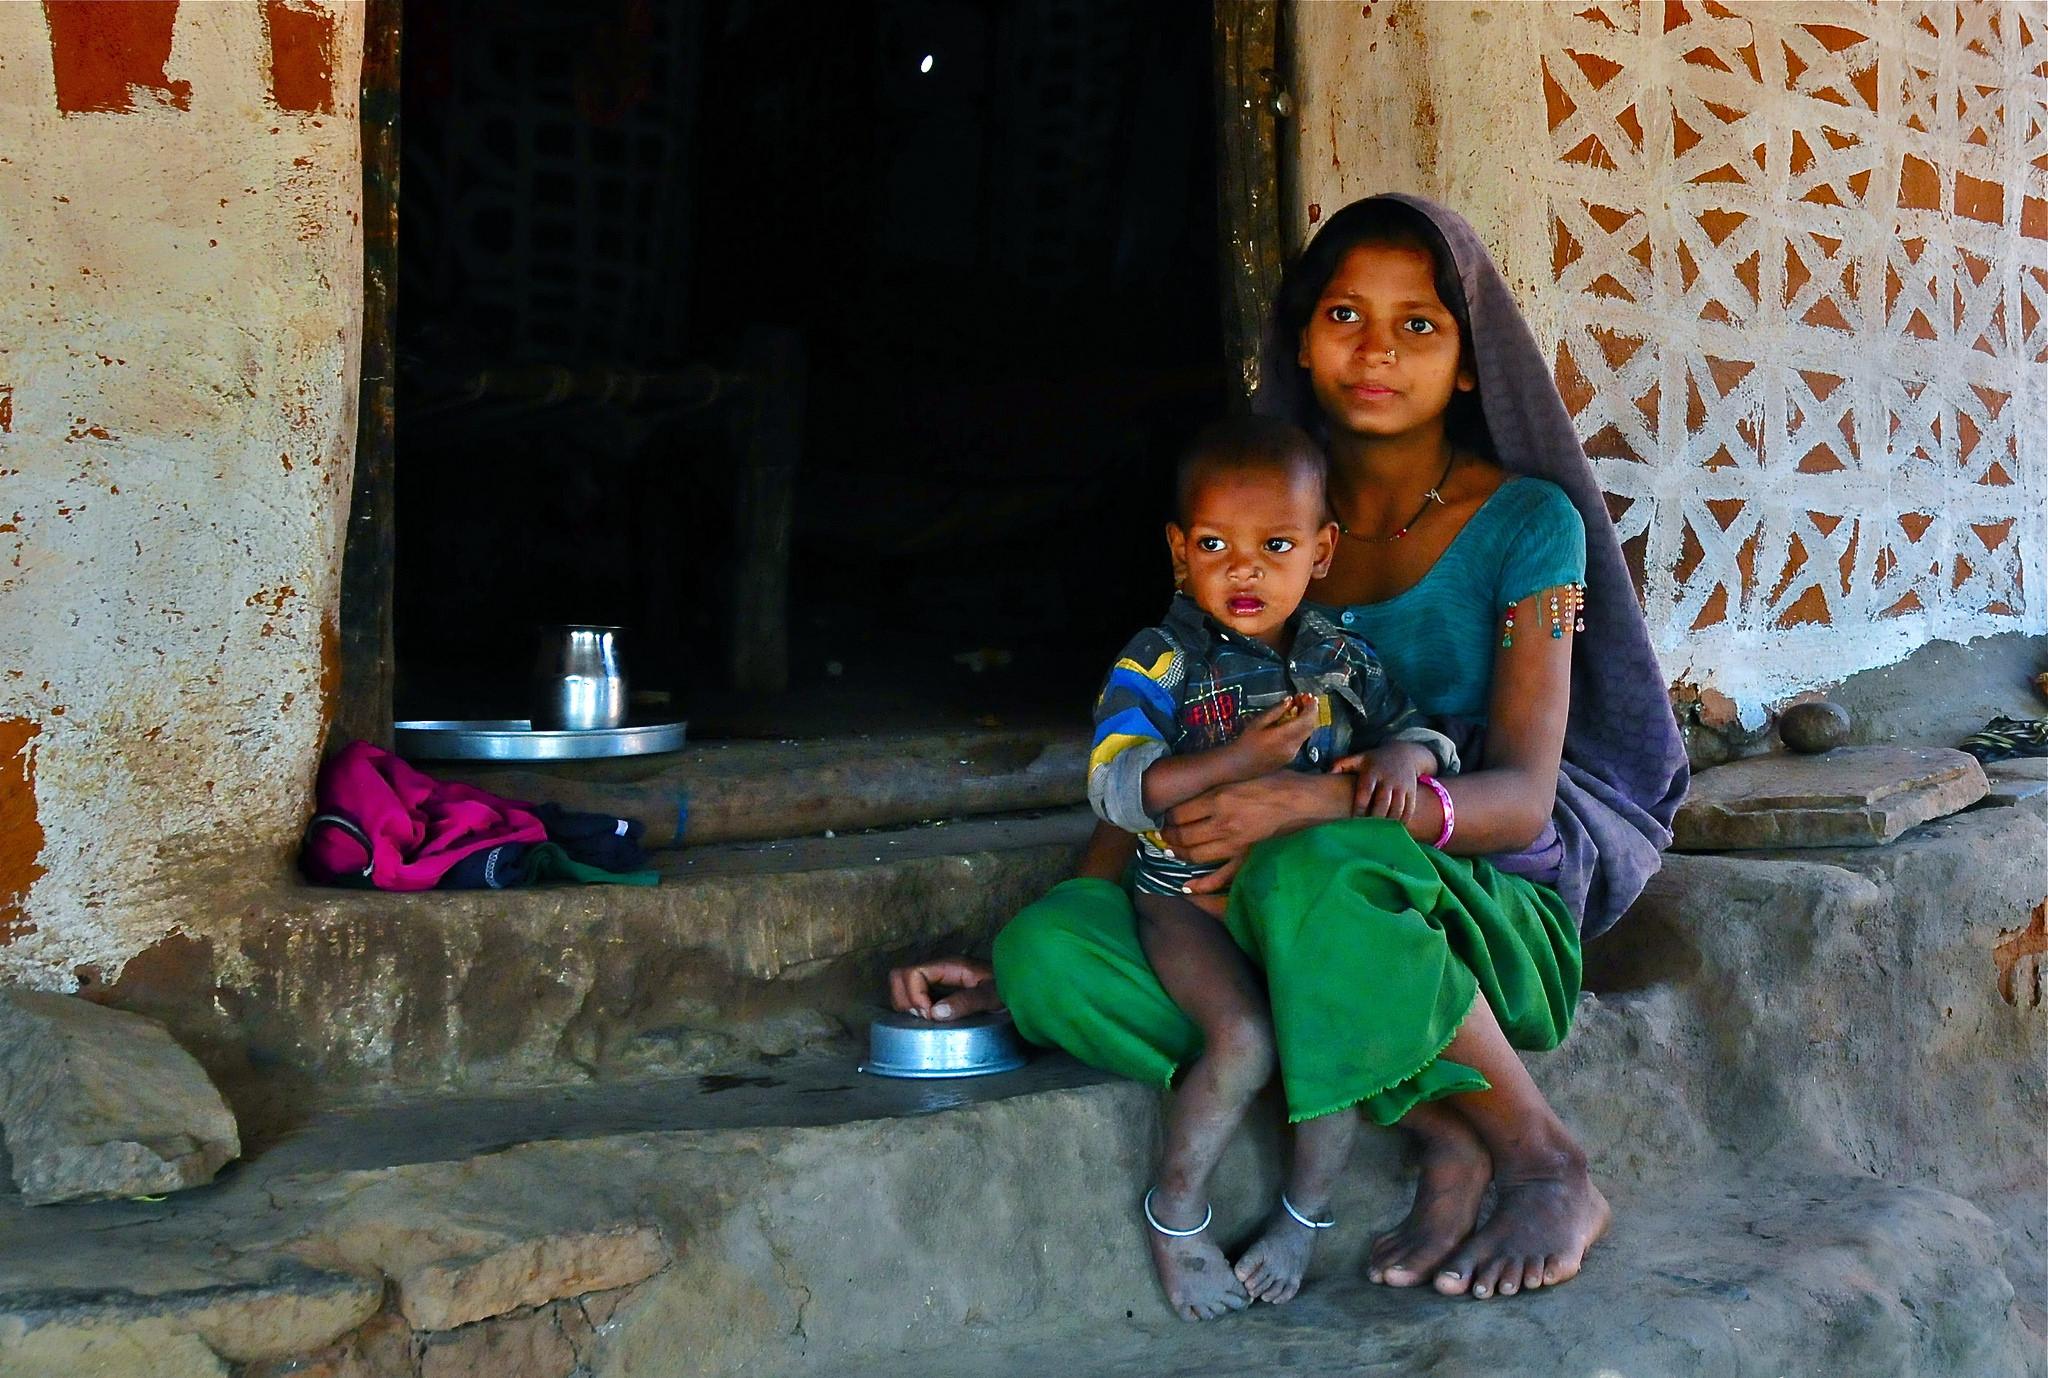 India- Gujarat- Adiwasi village- (Explore) by Donatella Venturi